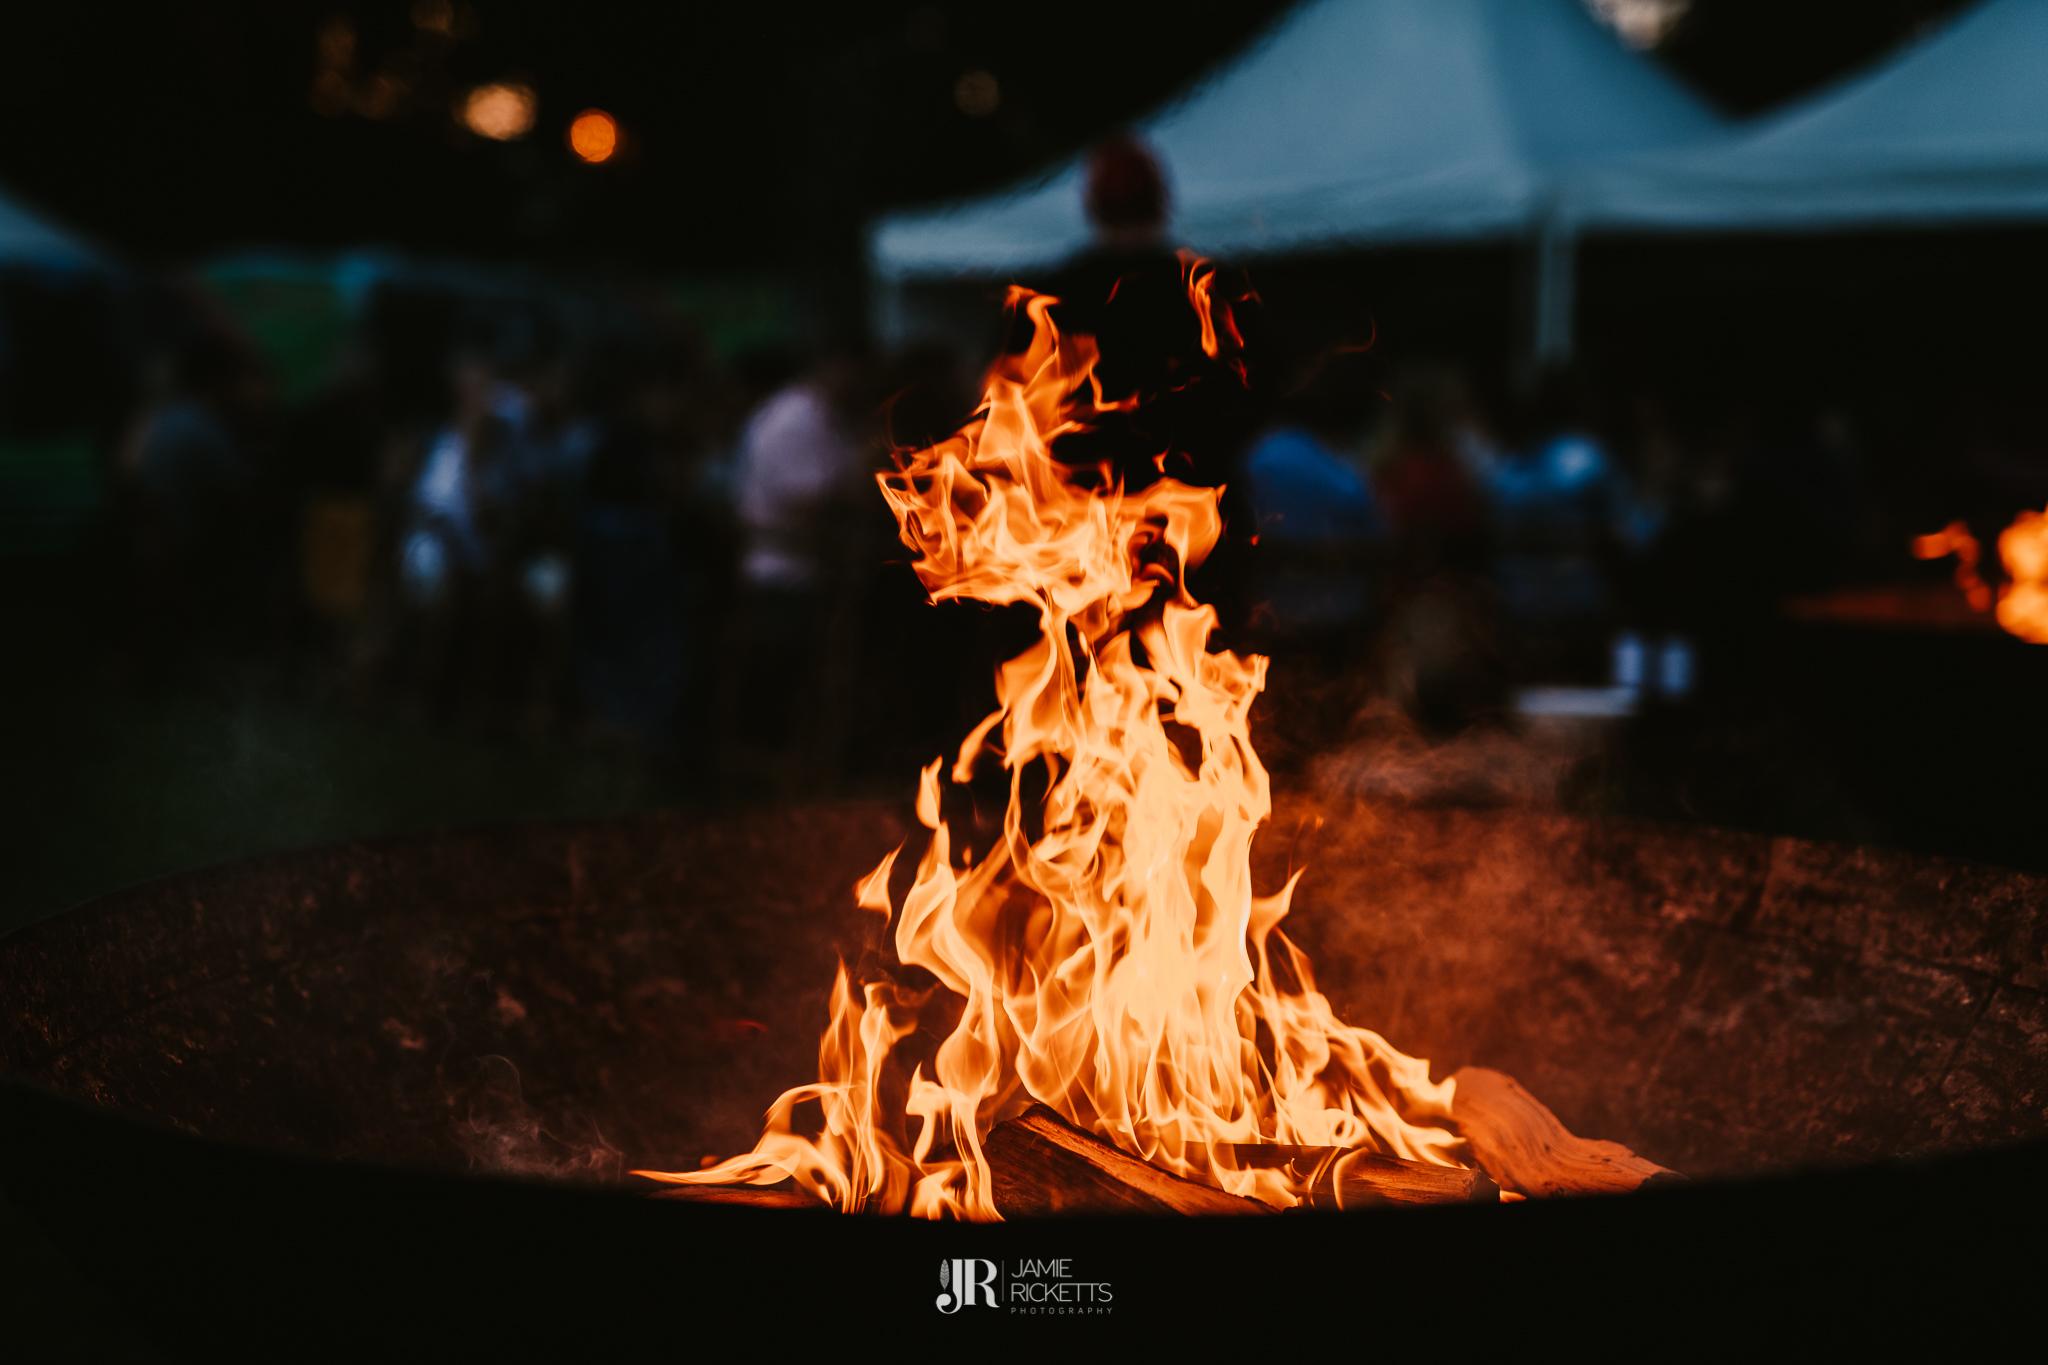 BBQ BANQUET NIGHT-28.06.2019-JR-SM-90.JPG